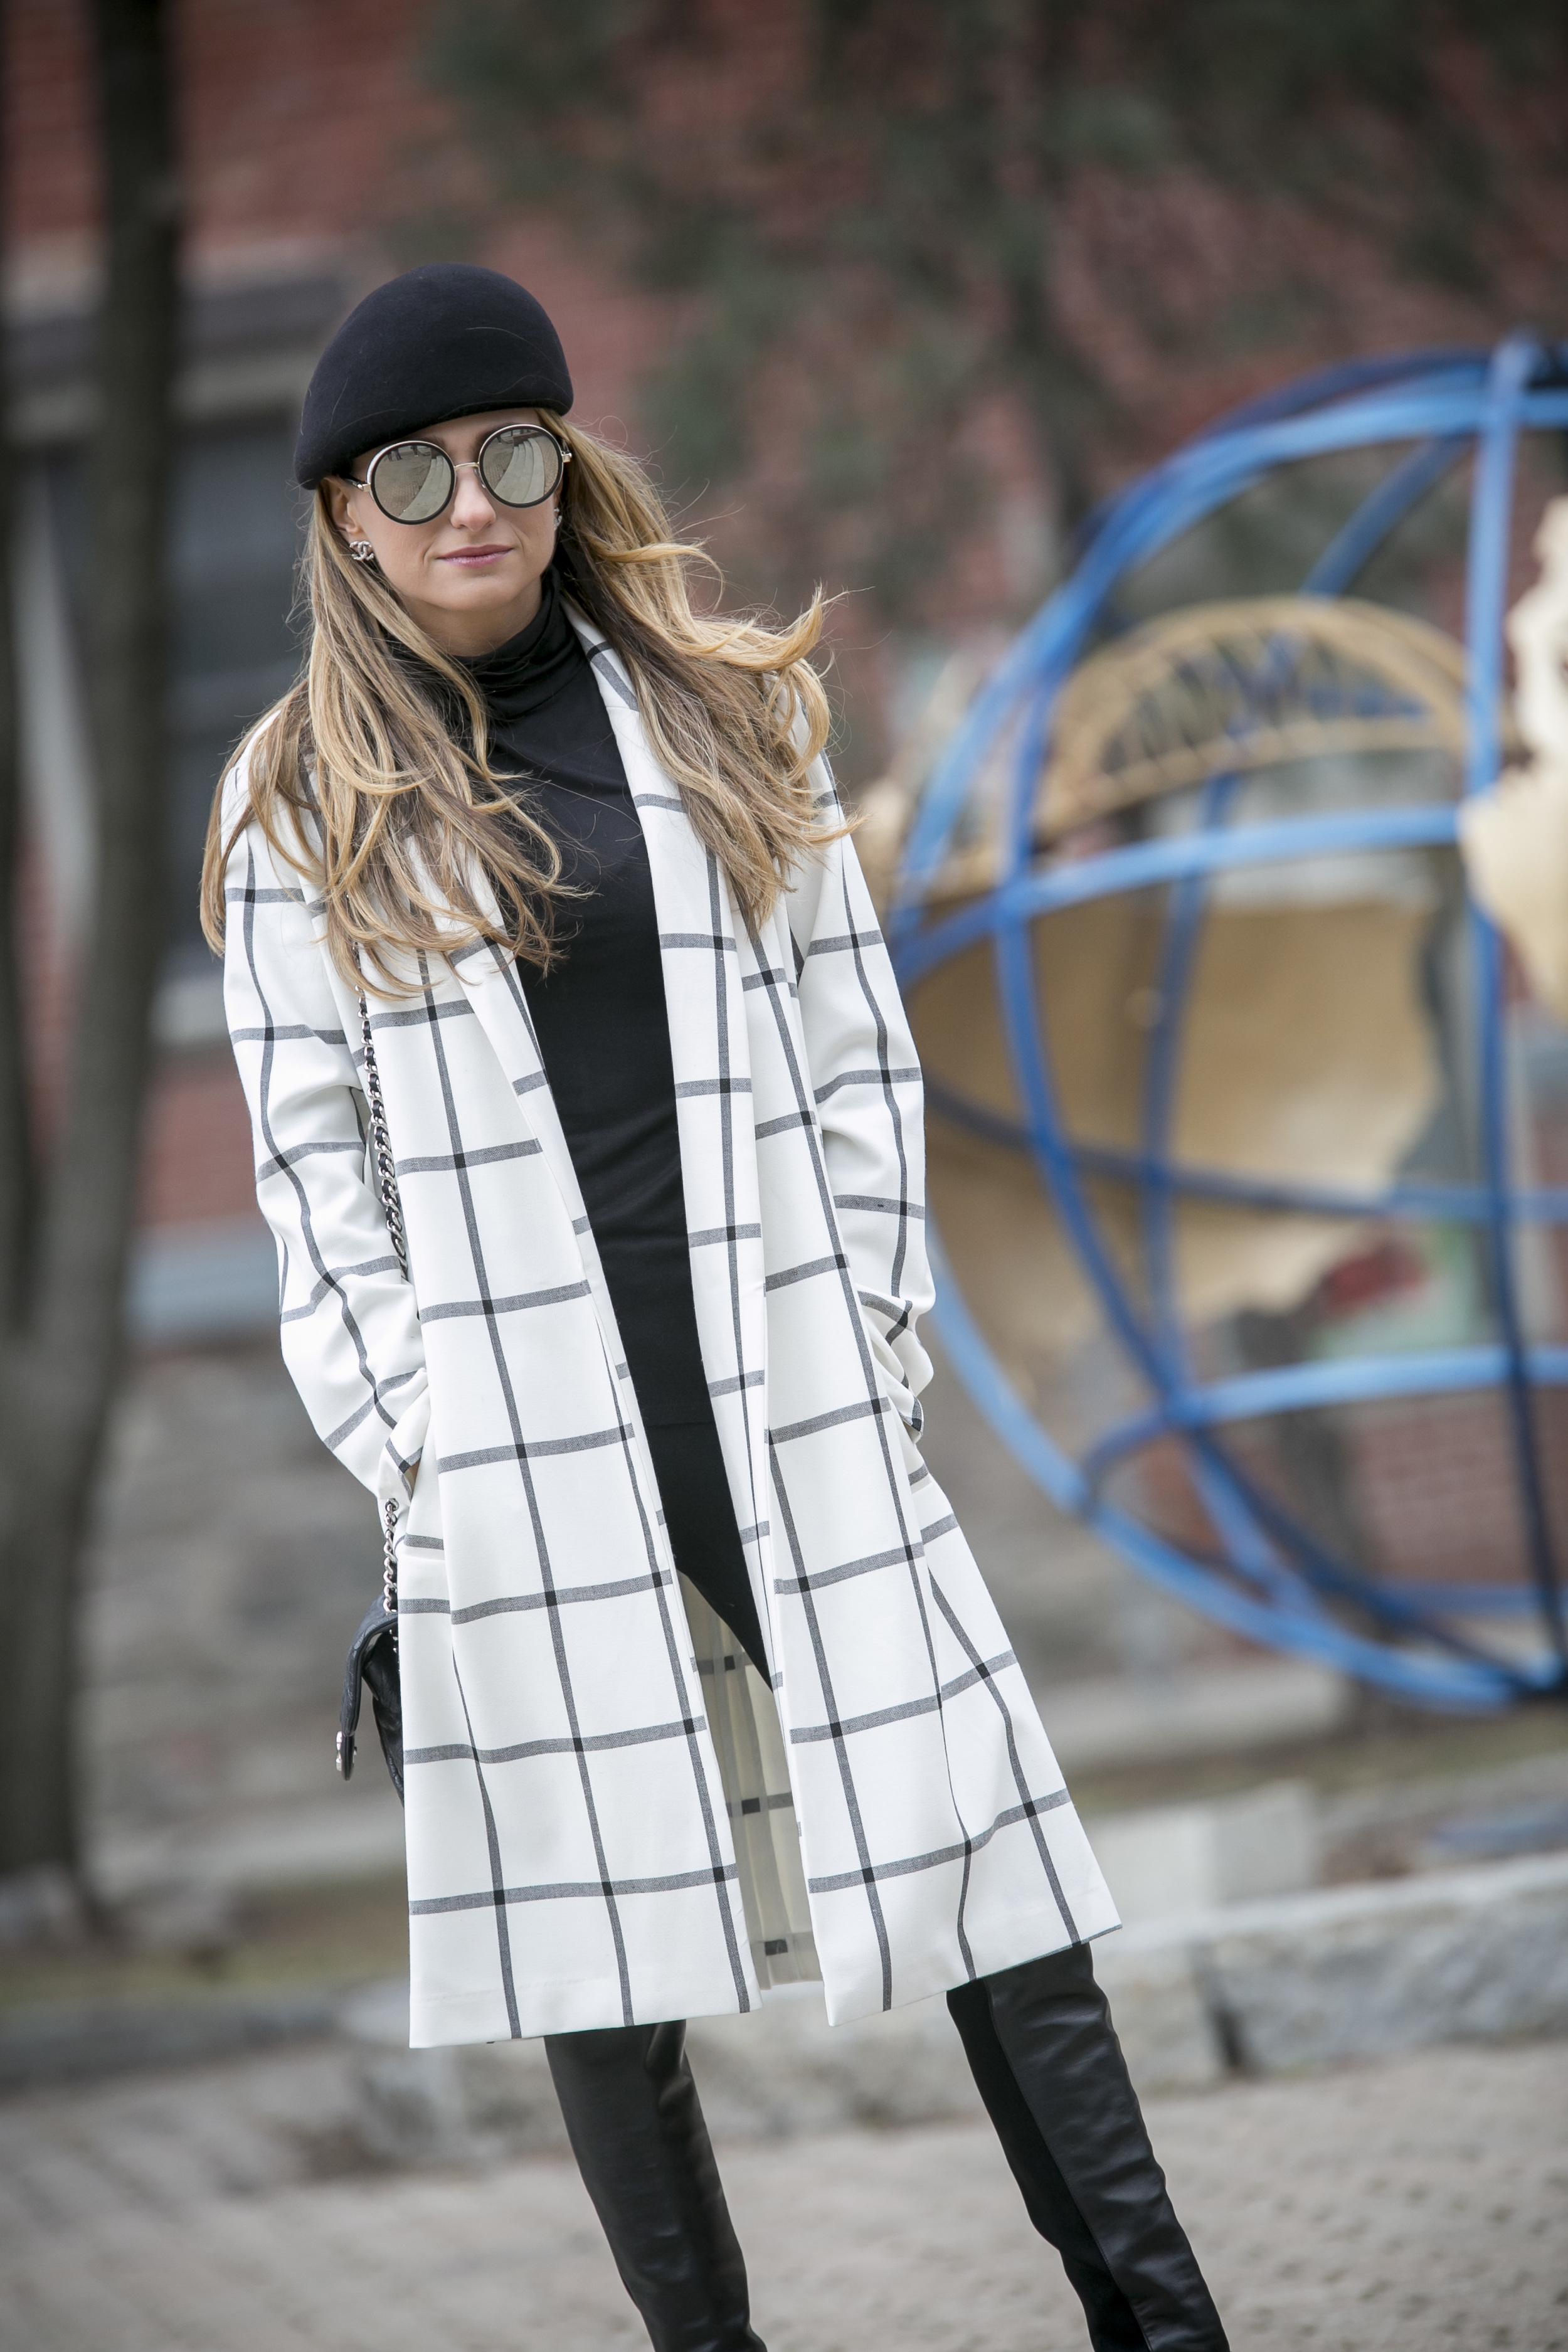 BB Dakota bronson jacket on blogger Lauren Recchia. Parisian chic.